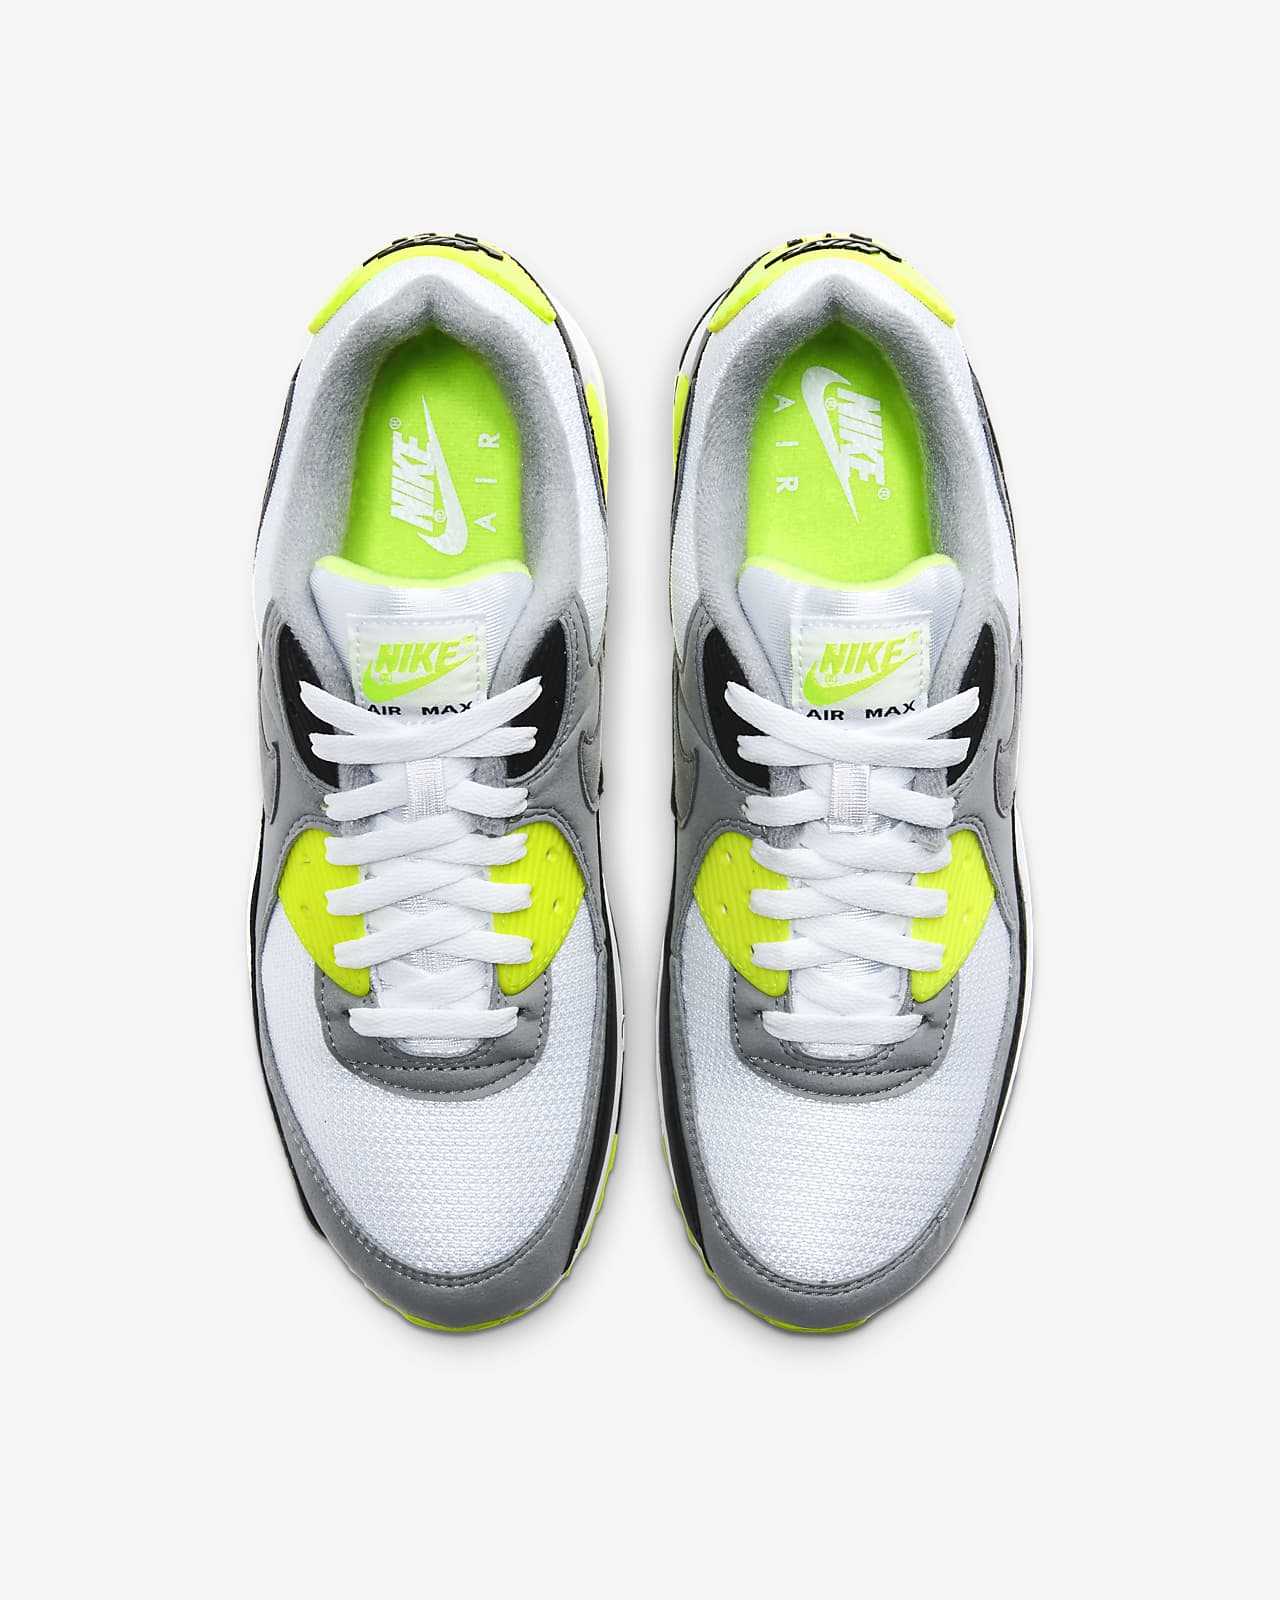 scarpe uomo nike air max bianche tutta belle